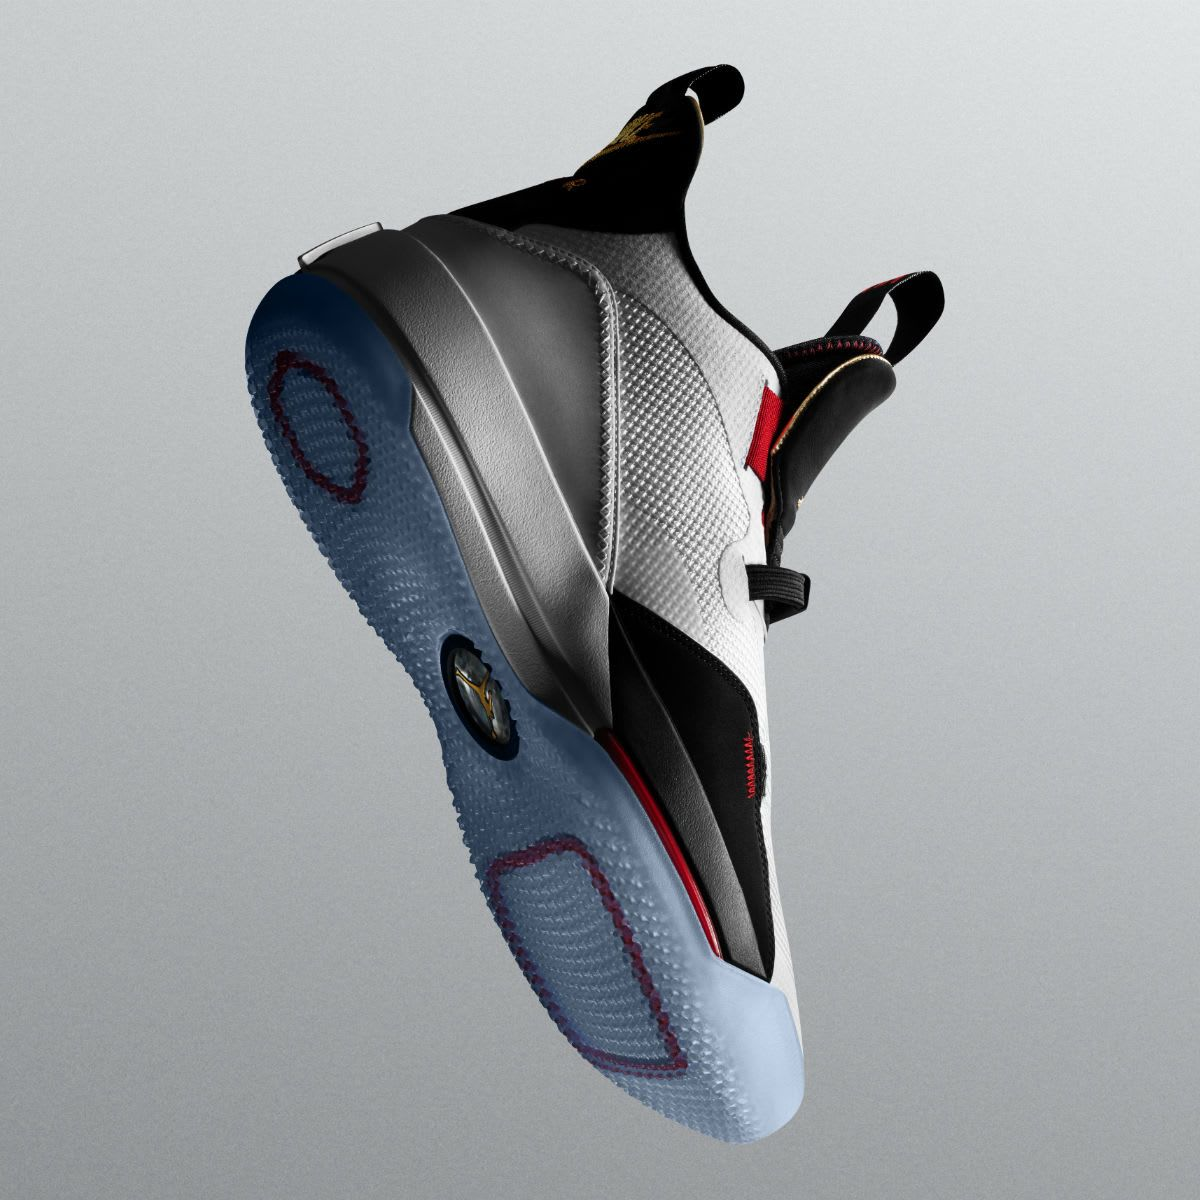 new concept 1b238 3a08a Air Jordan 3, Air Jordan De Nike, Tenis